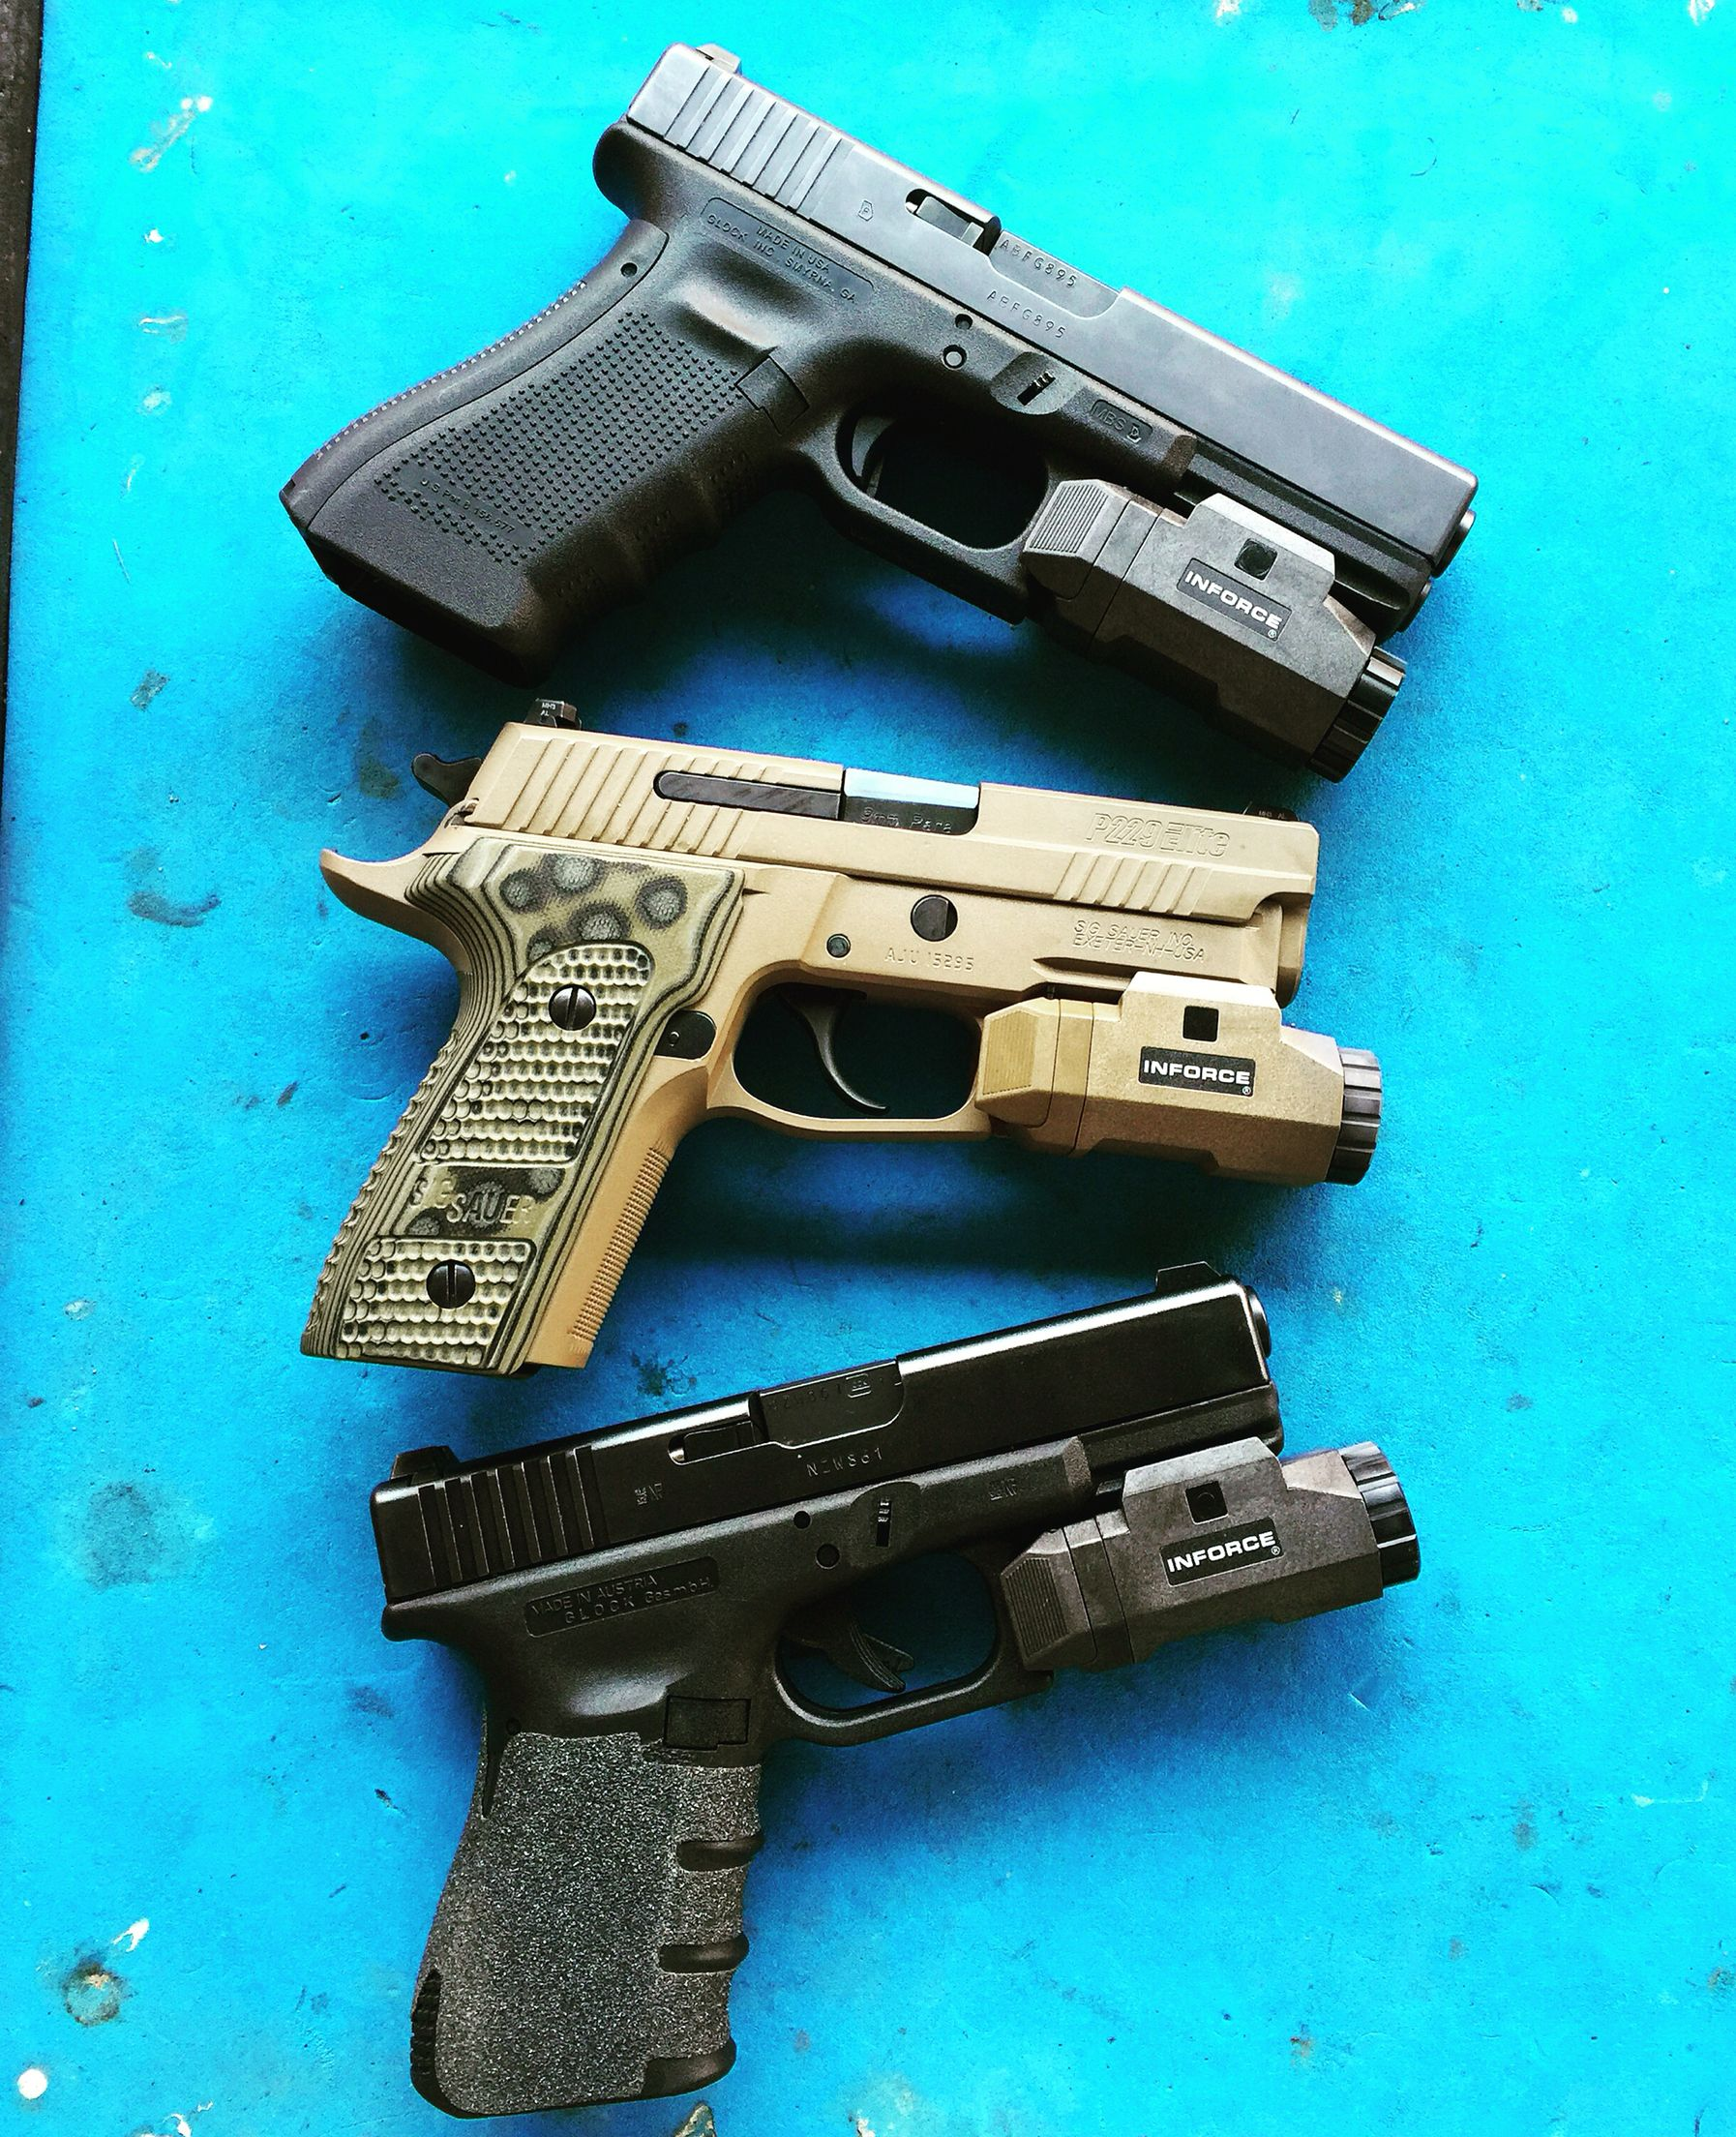 Pin by RAE Industries on Sig Sauer | Guns, Hand guns, Sig sauer